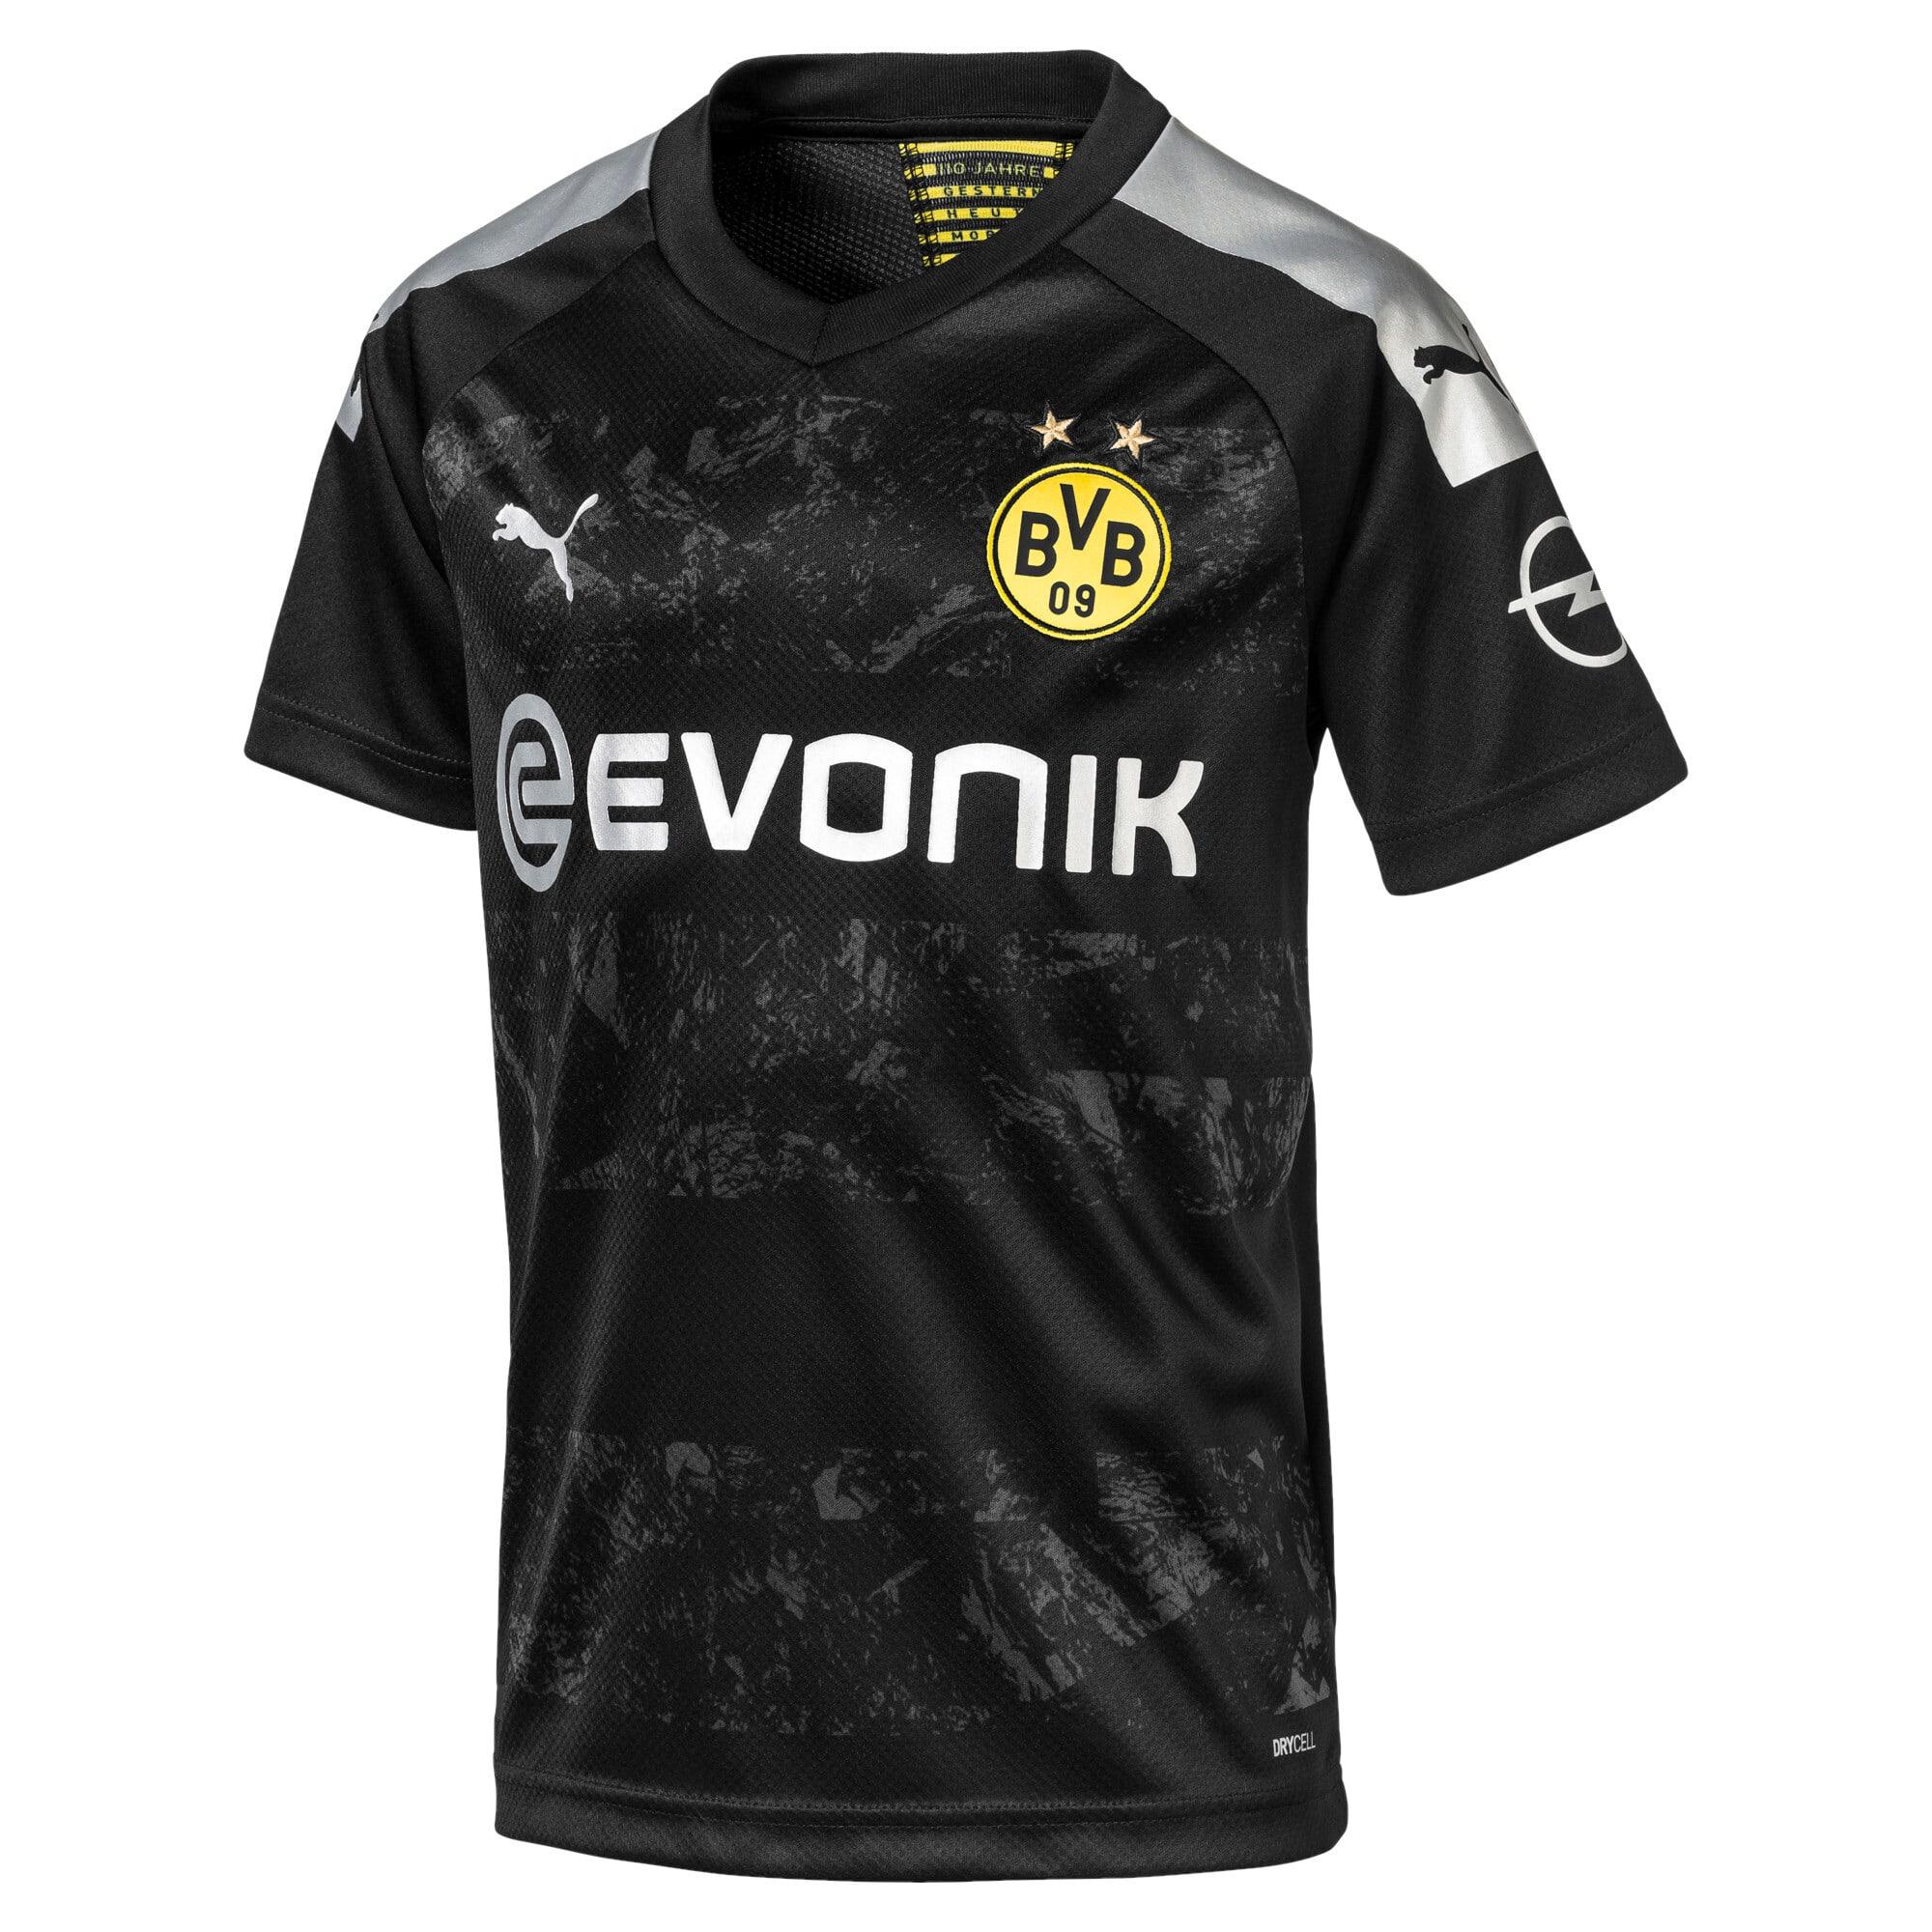 Thumbnail 1 of BVB Jungen Replica Auswärtstrikot, Puma Black, medium